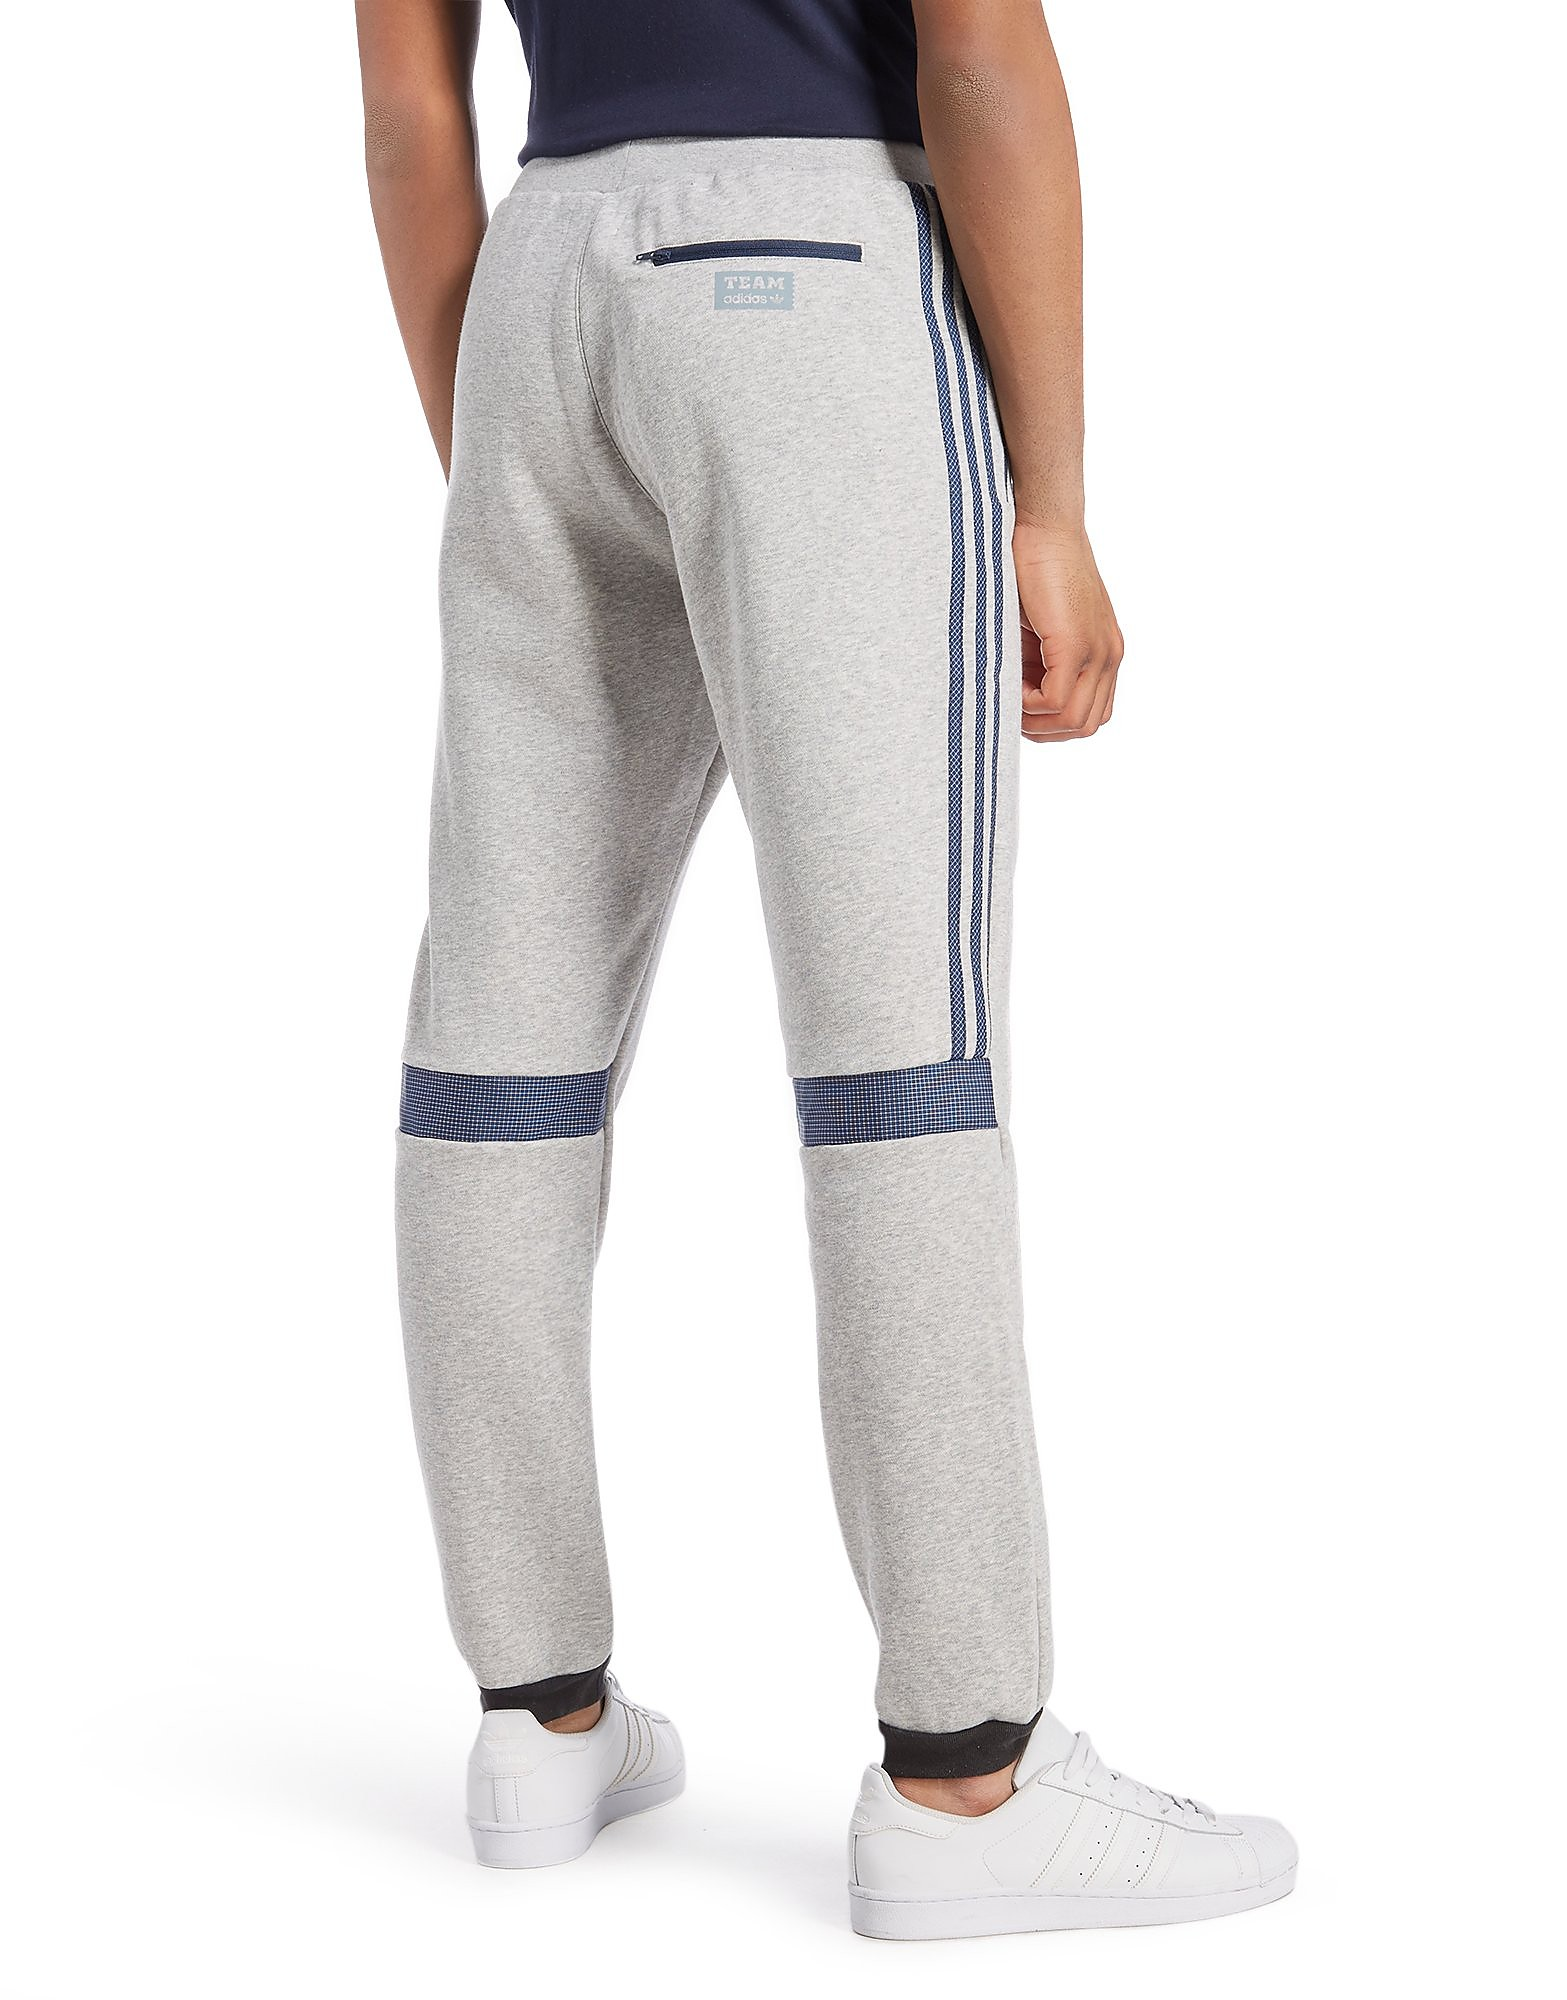 adidas Originals Team Panel Fleece Pants